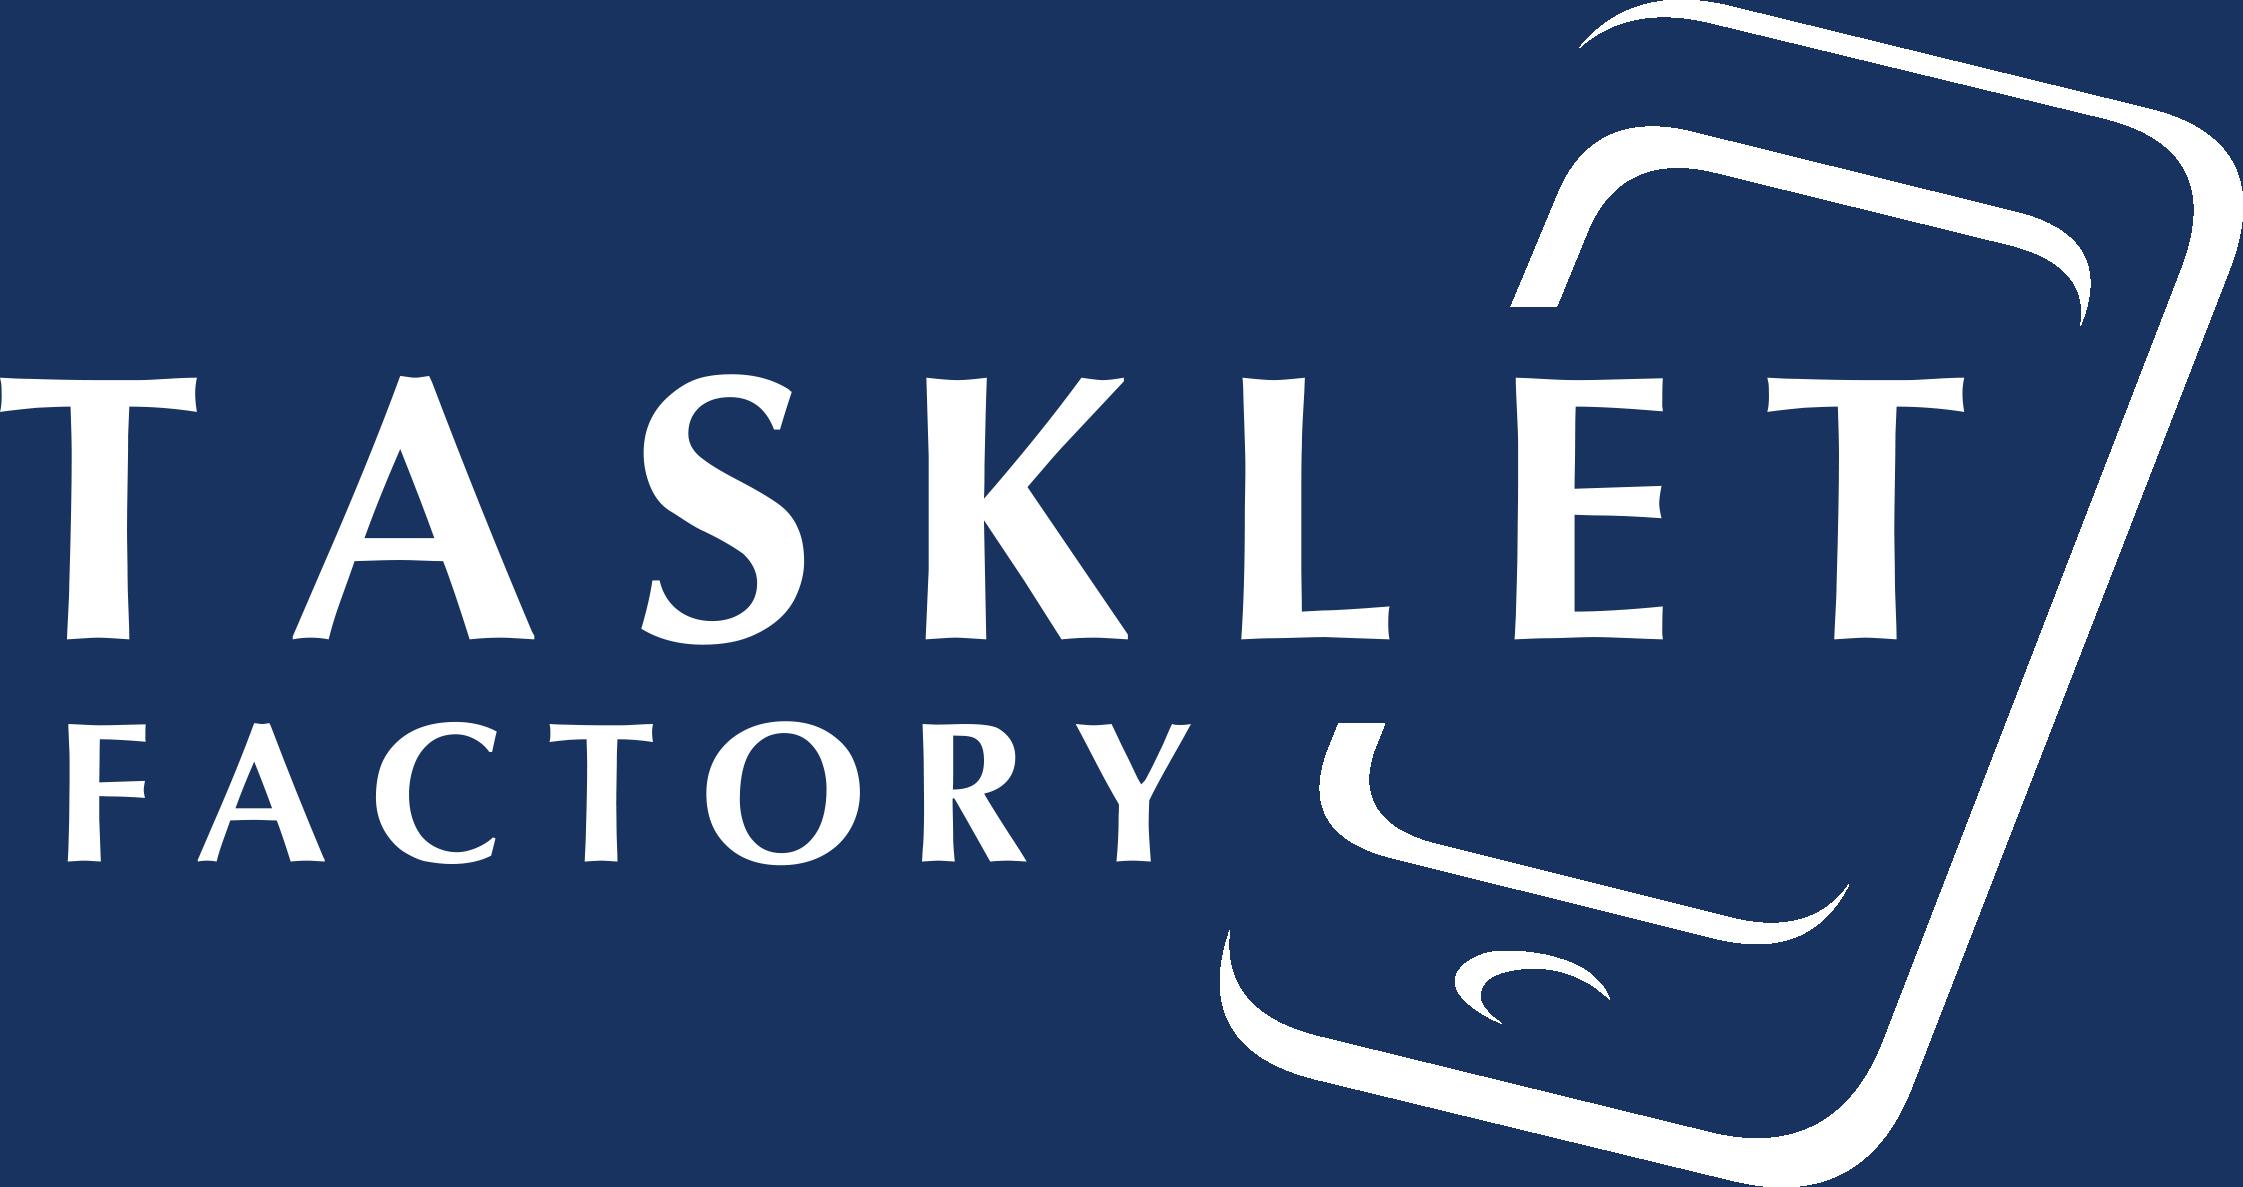 Tasklet Factory_logo